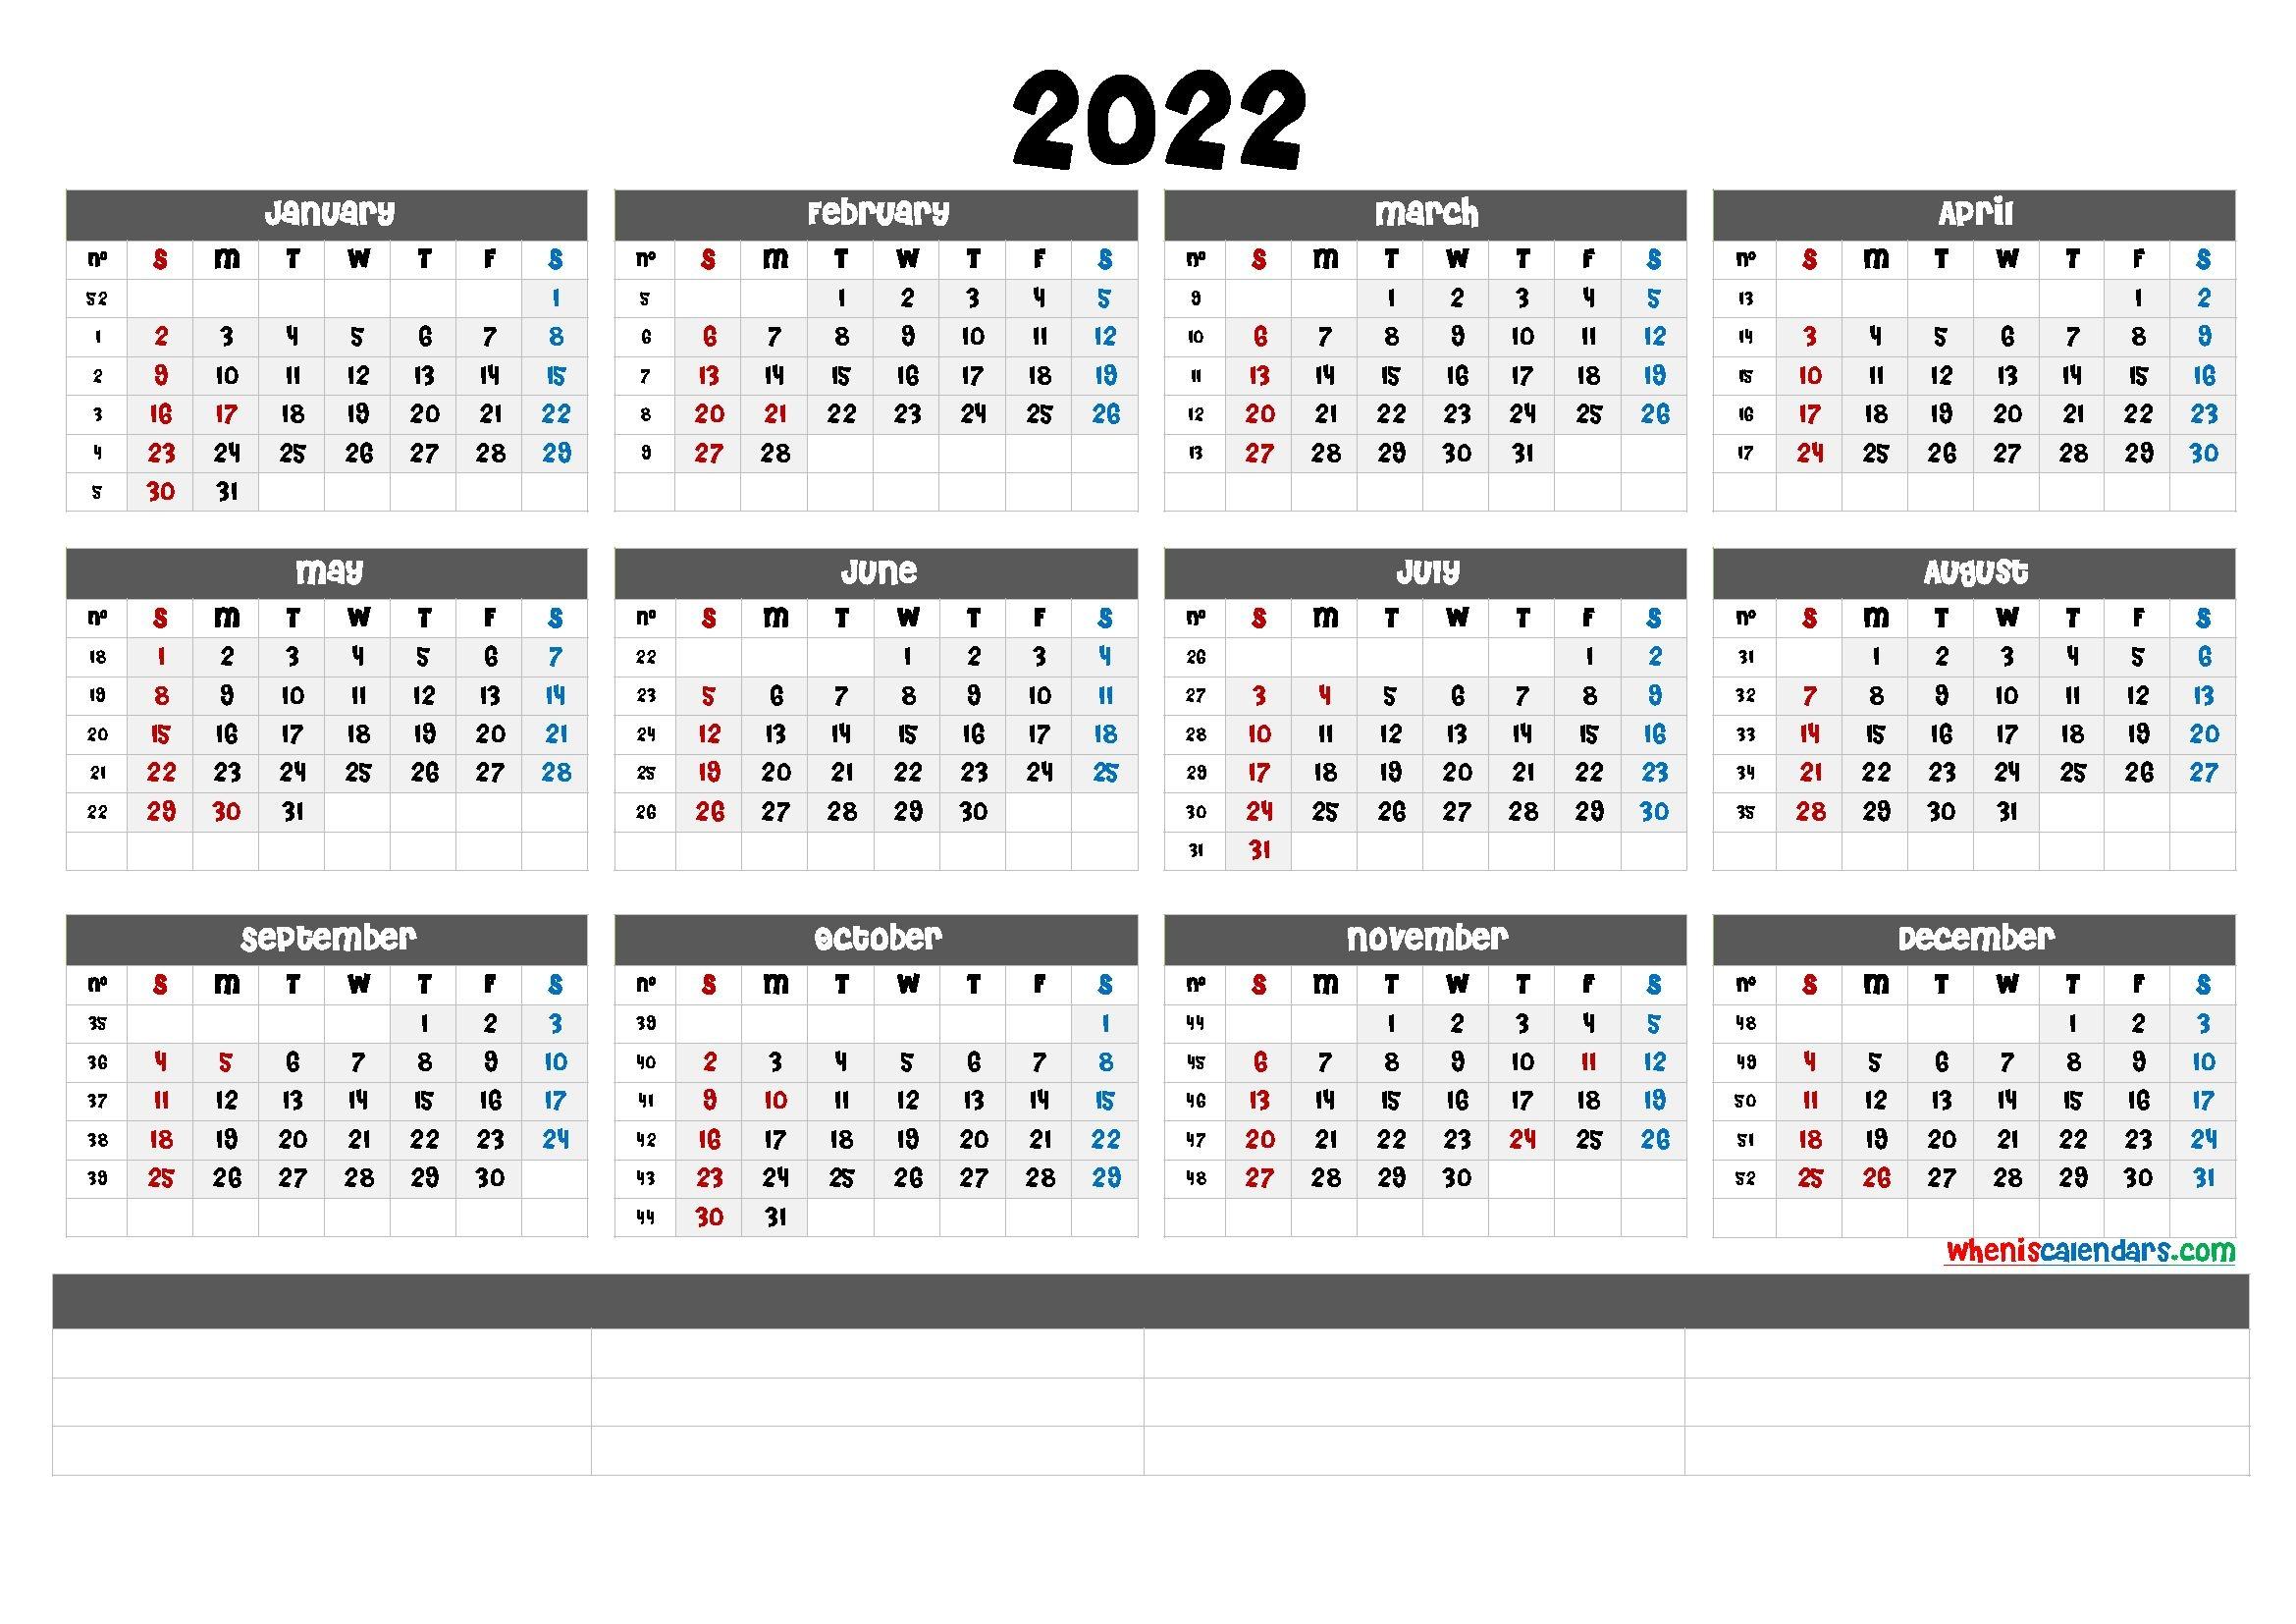 Free Printable 2022 Calendar By Month - Calendarex